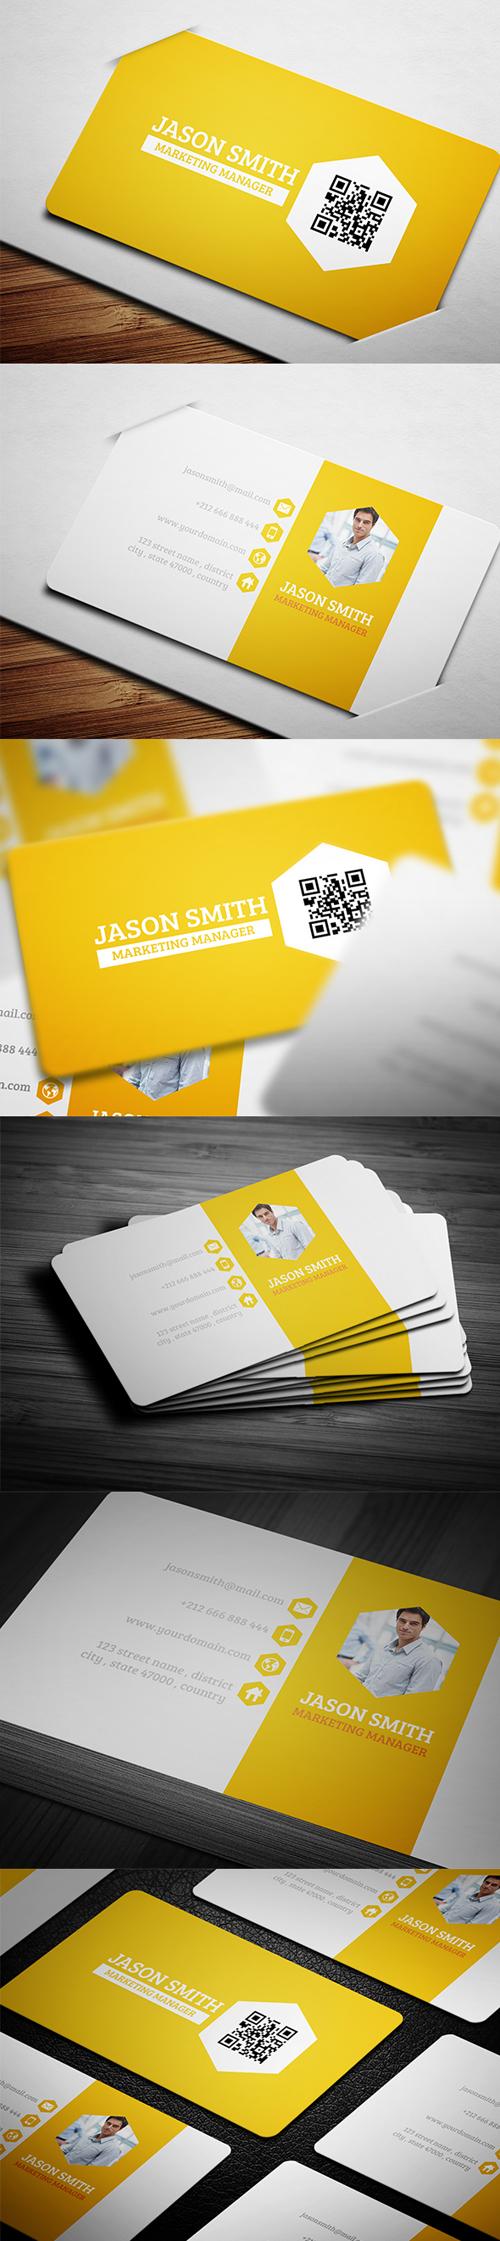 business cards template design - 4